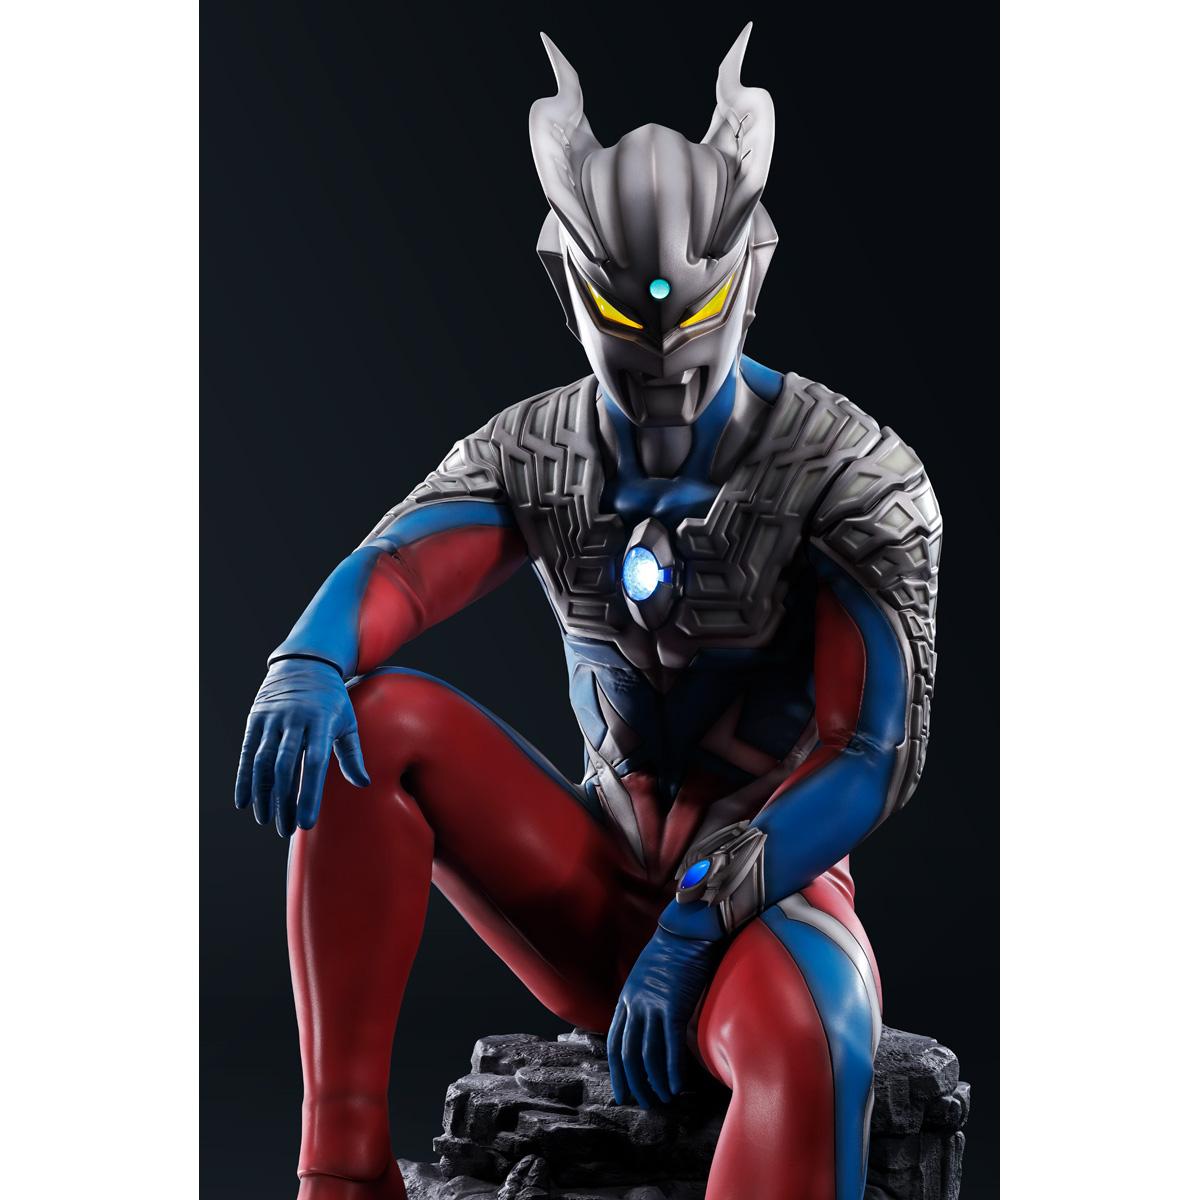 S.H.Figuarts Ultraman Zero 10th anniversary Special Color Ver Tamashi Event 202